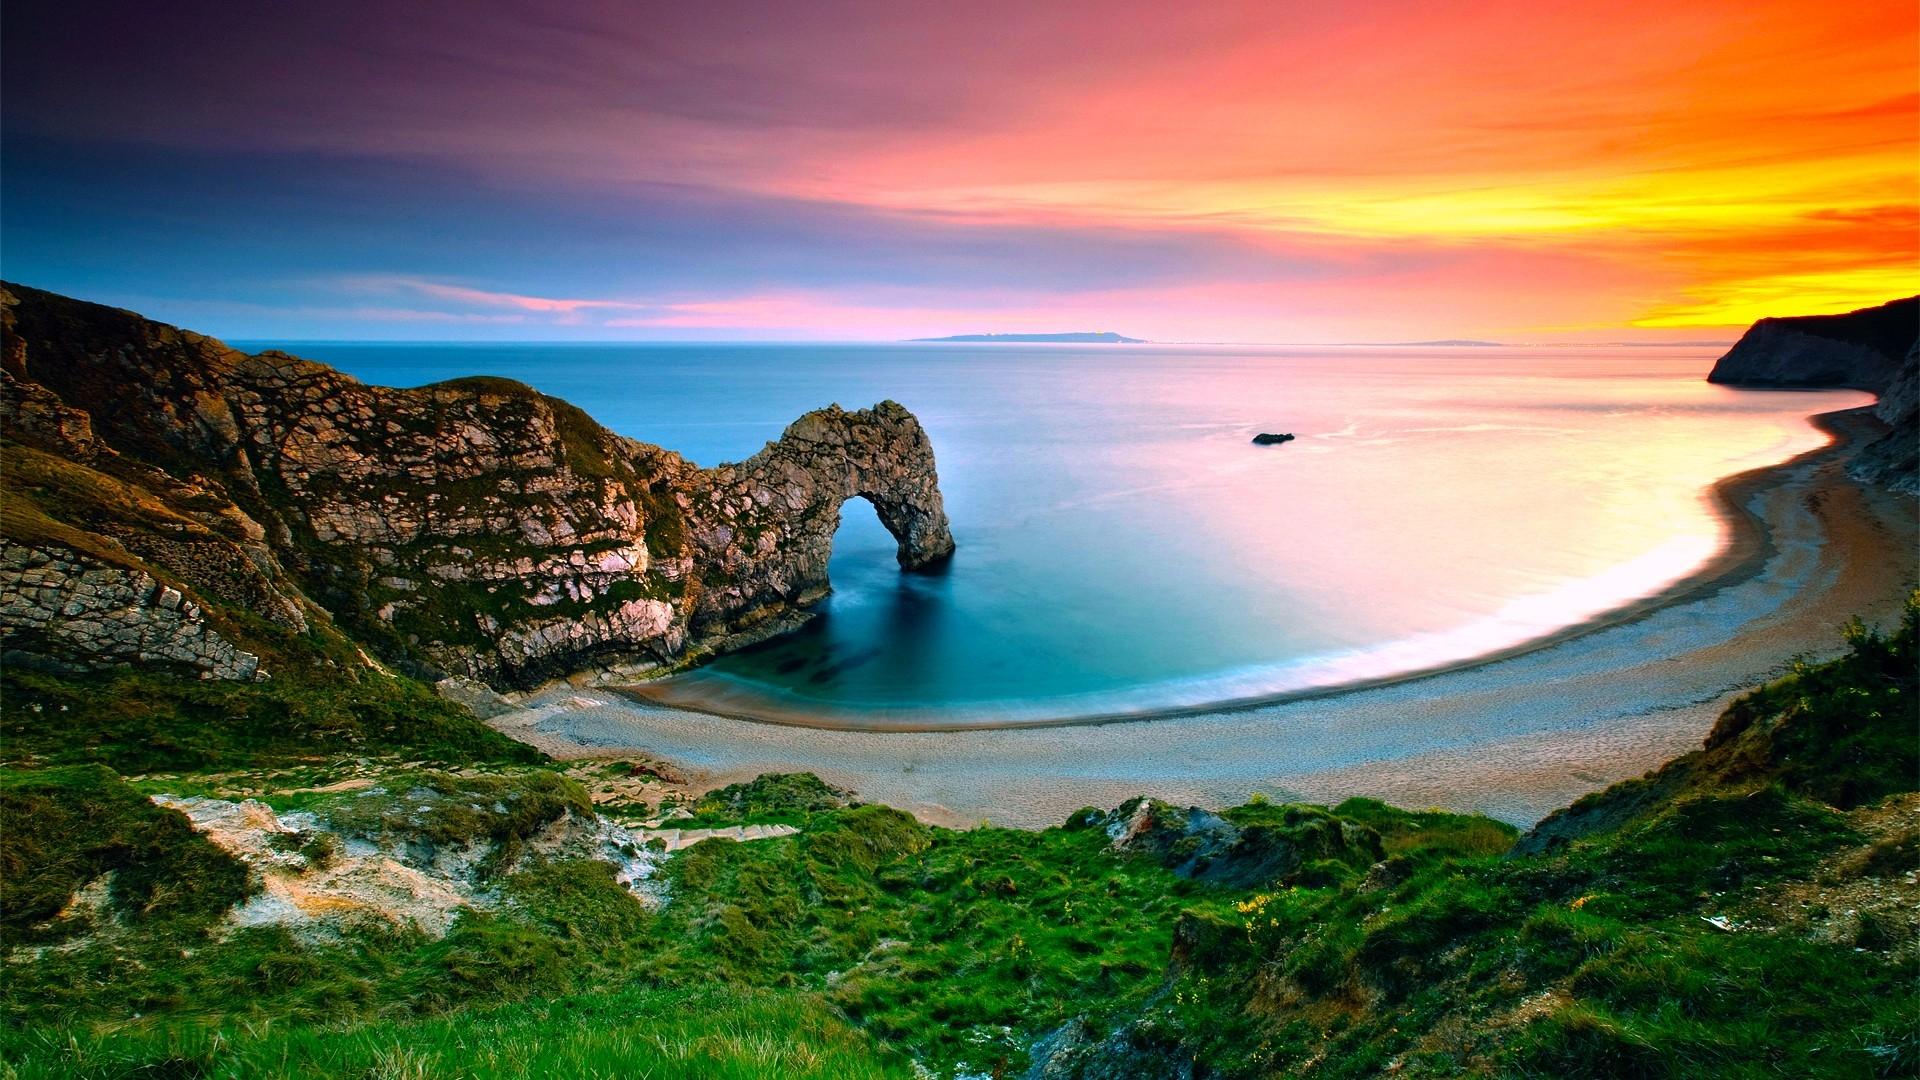 landscape ocean beach HD Desktop Wallpaper HD Desktop Wallpaper 1920x1080